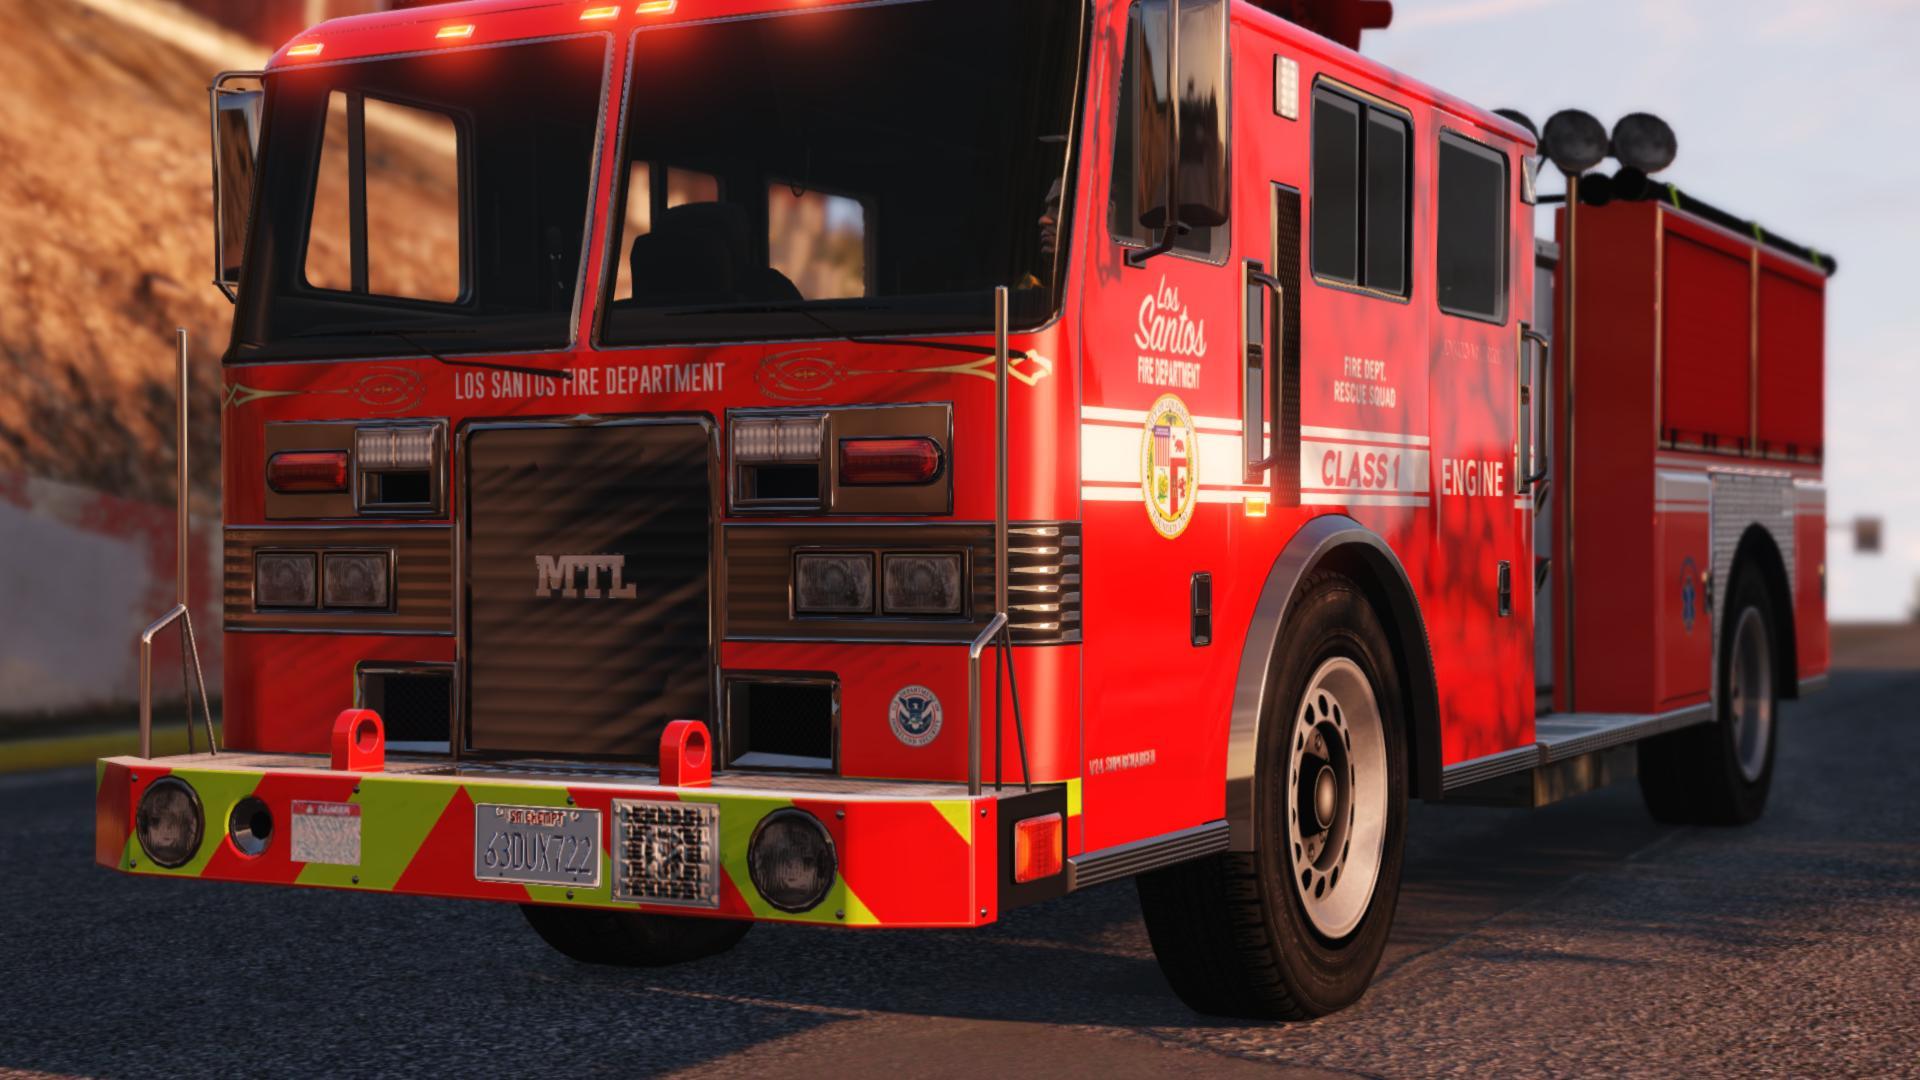 Los Santos Fire Department Engine + Firefighters - GTA5-Mods com